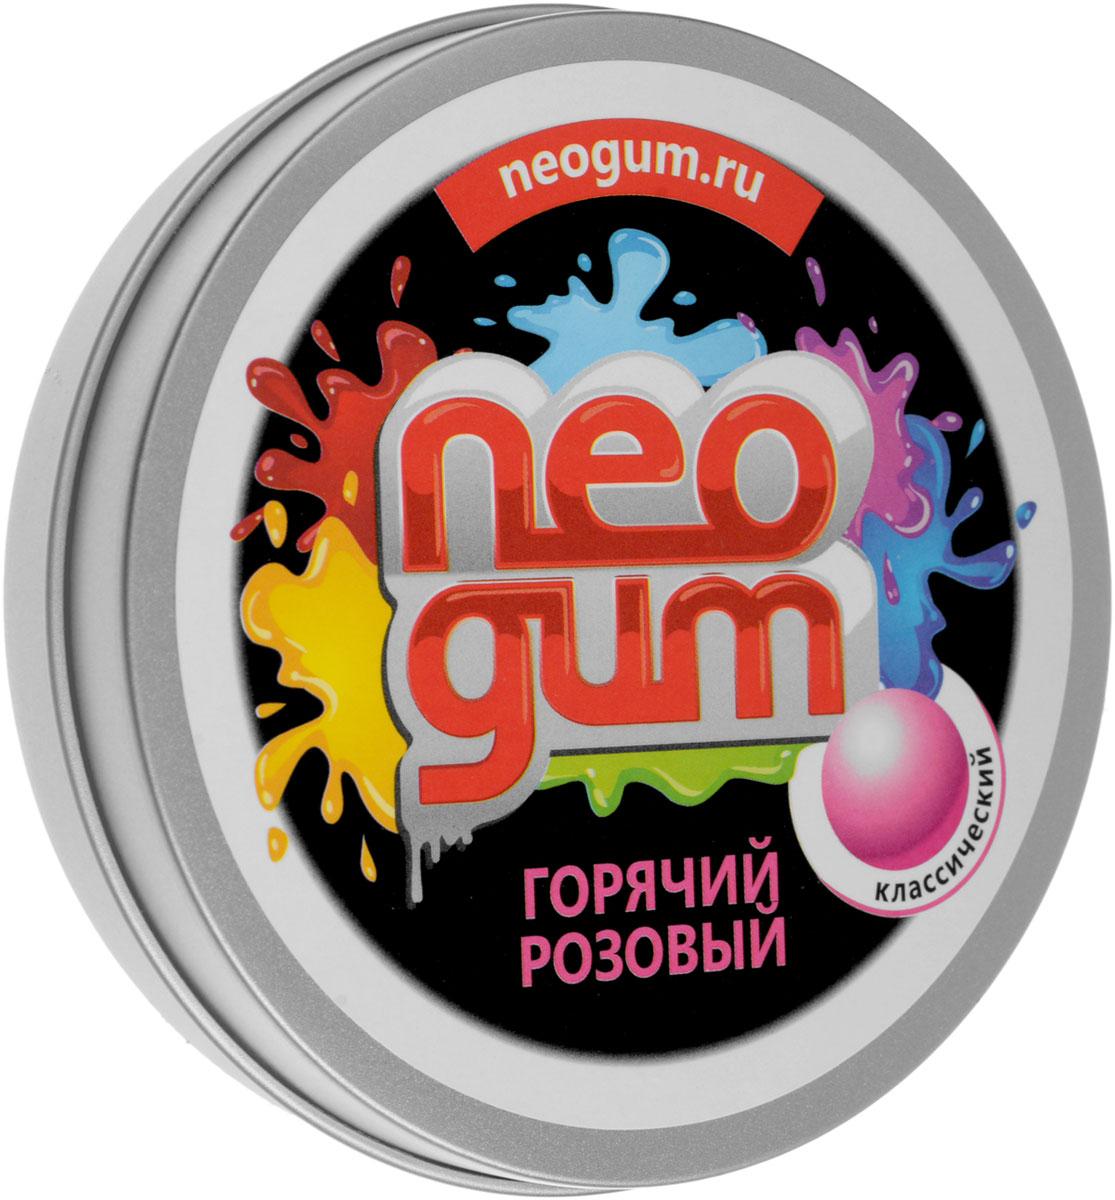 Neogum Жвачка для рук Горячий розовый жвачка для рук меняющая цвет